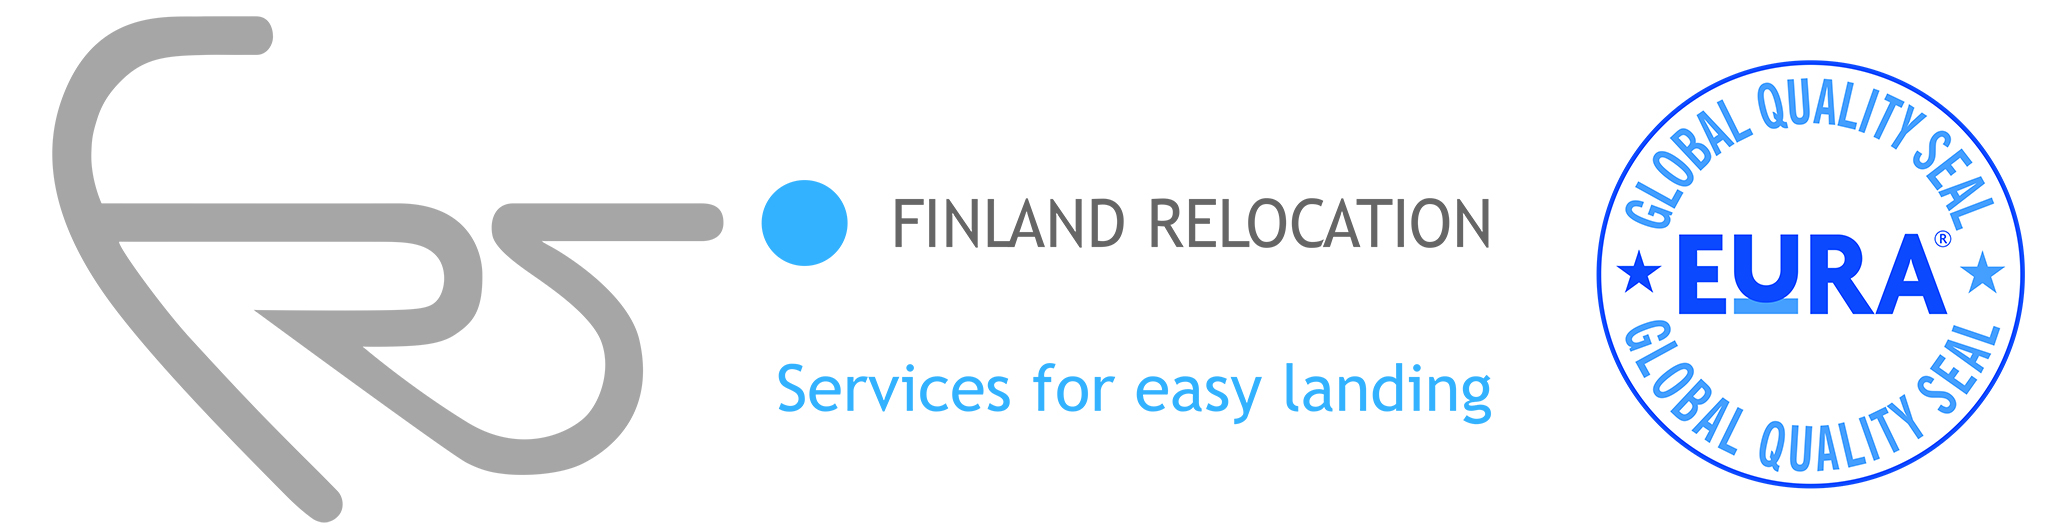 Link to external partner website finlandrelocation.com